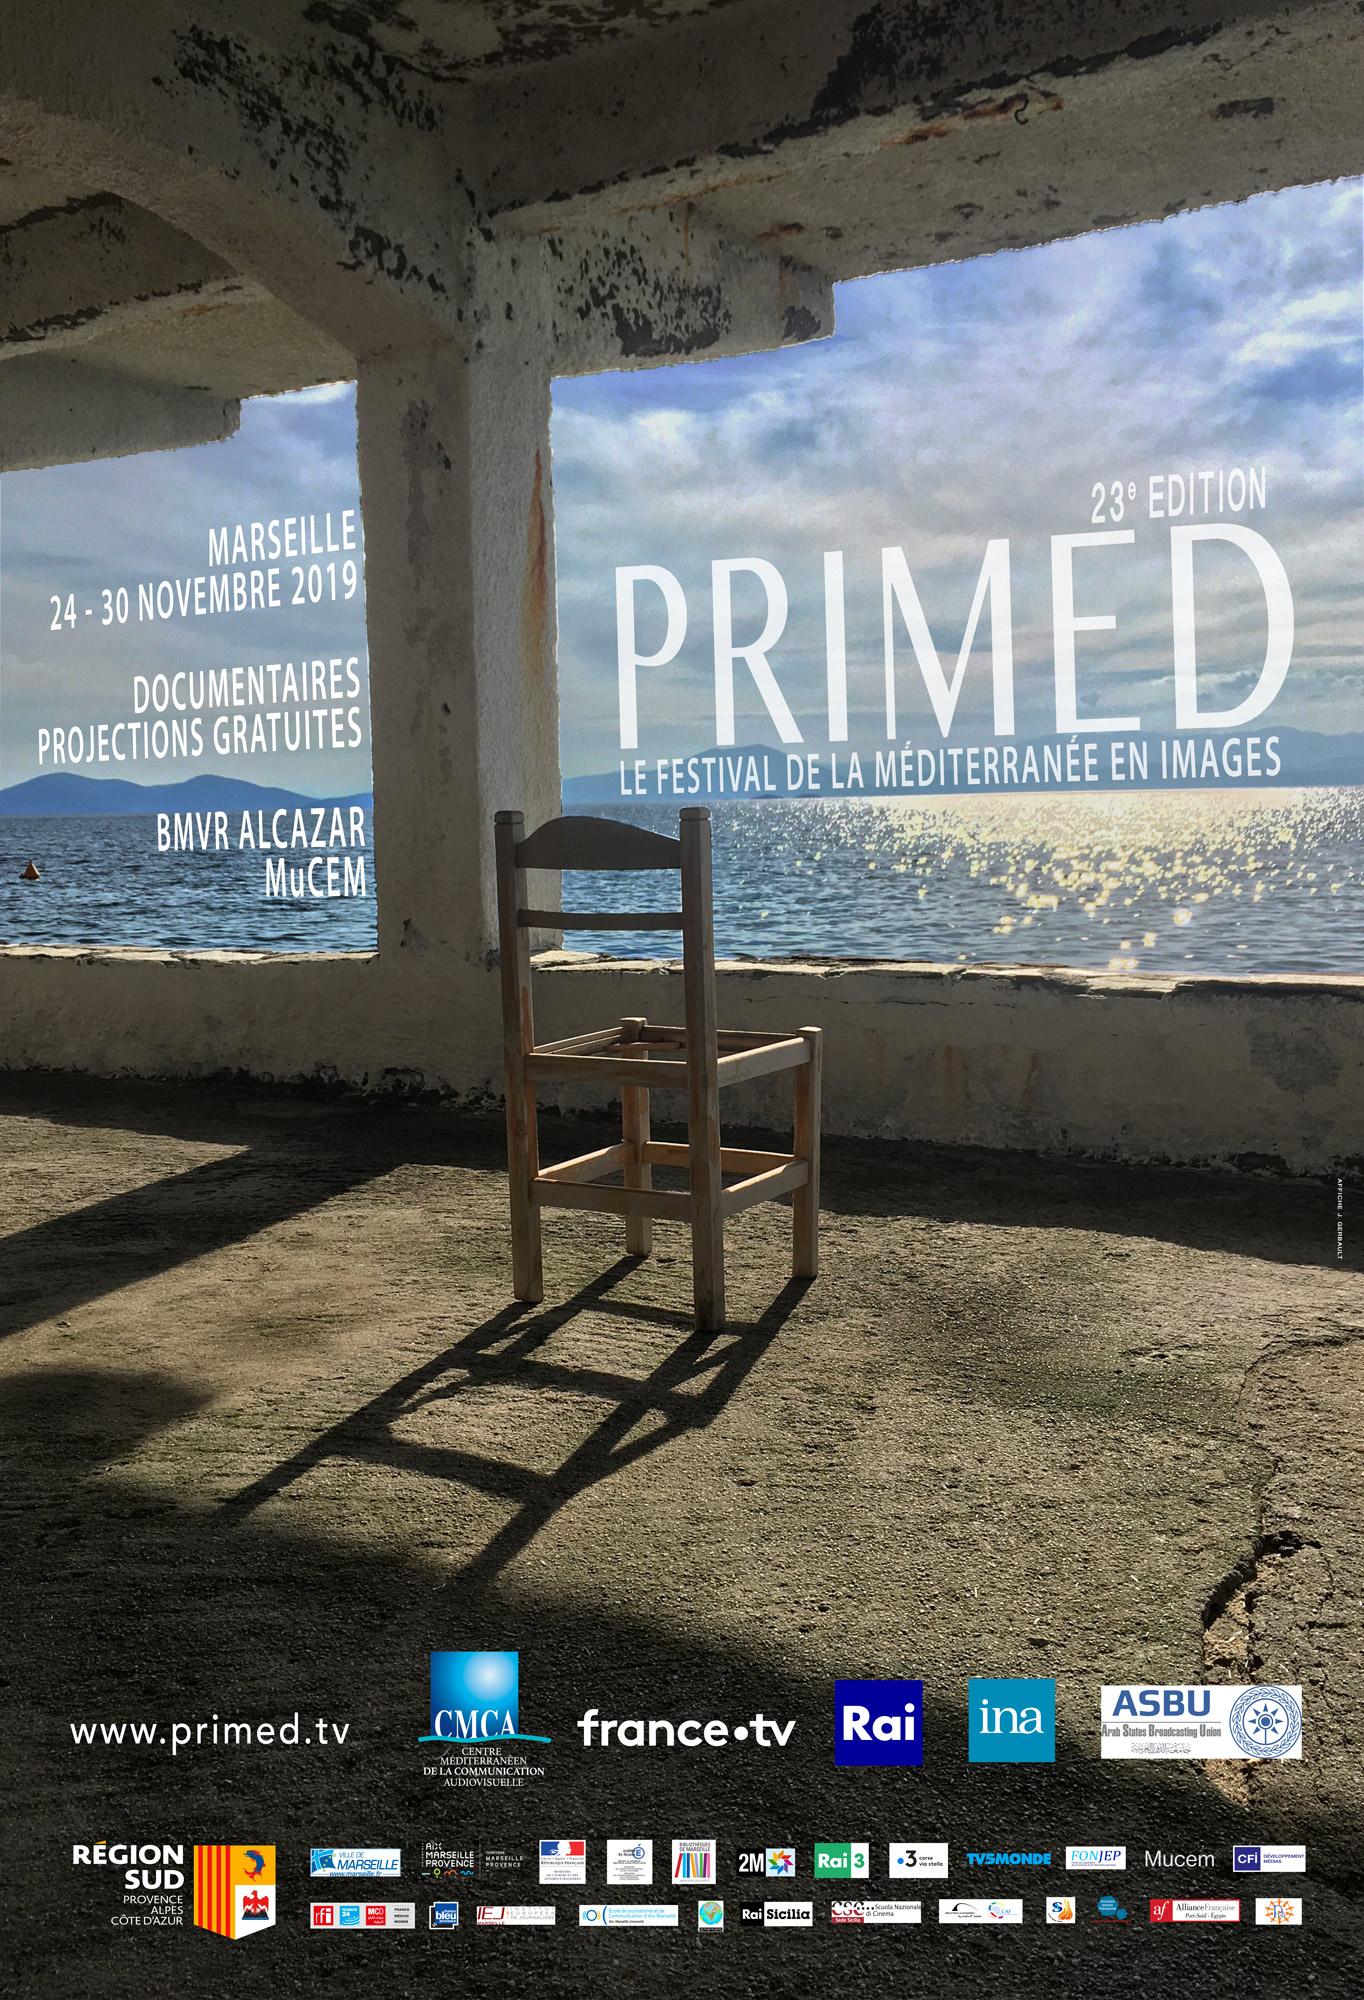 poster of PriMed 2019